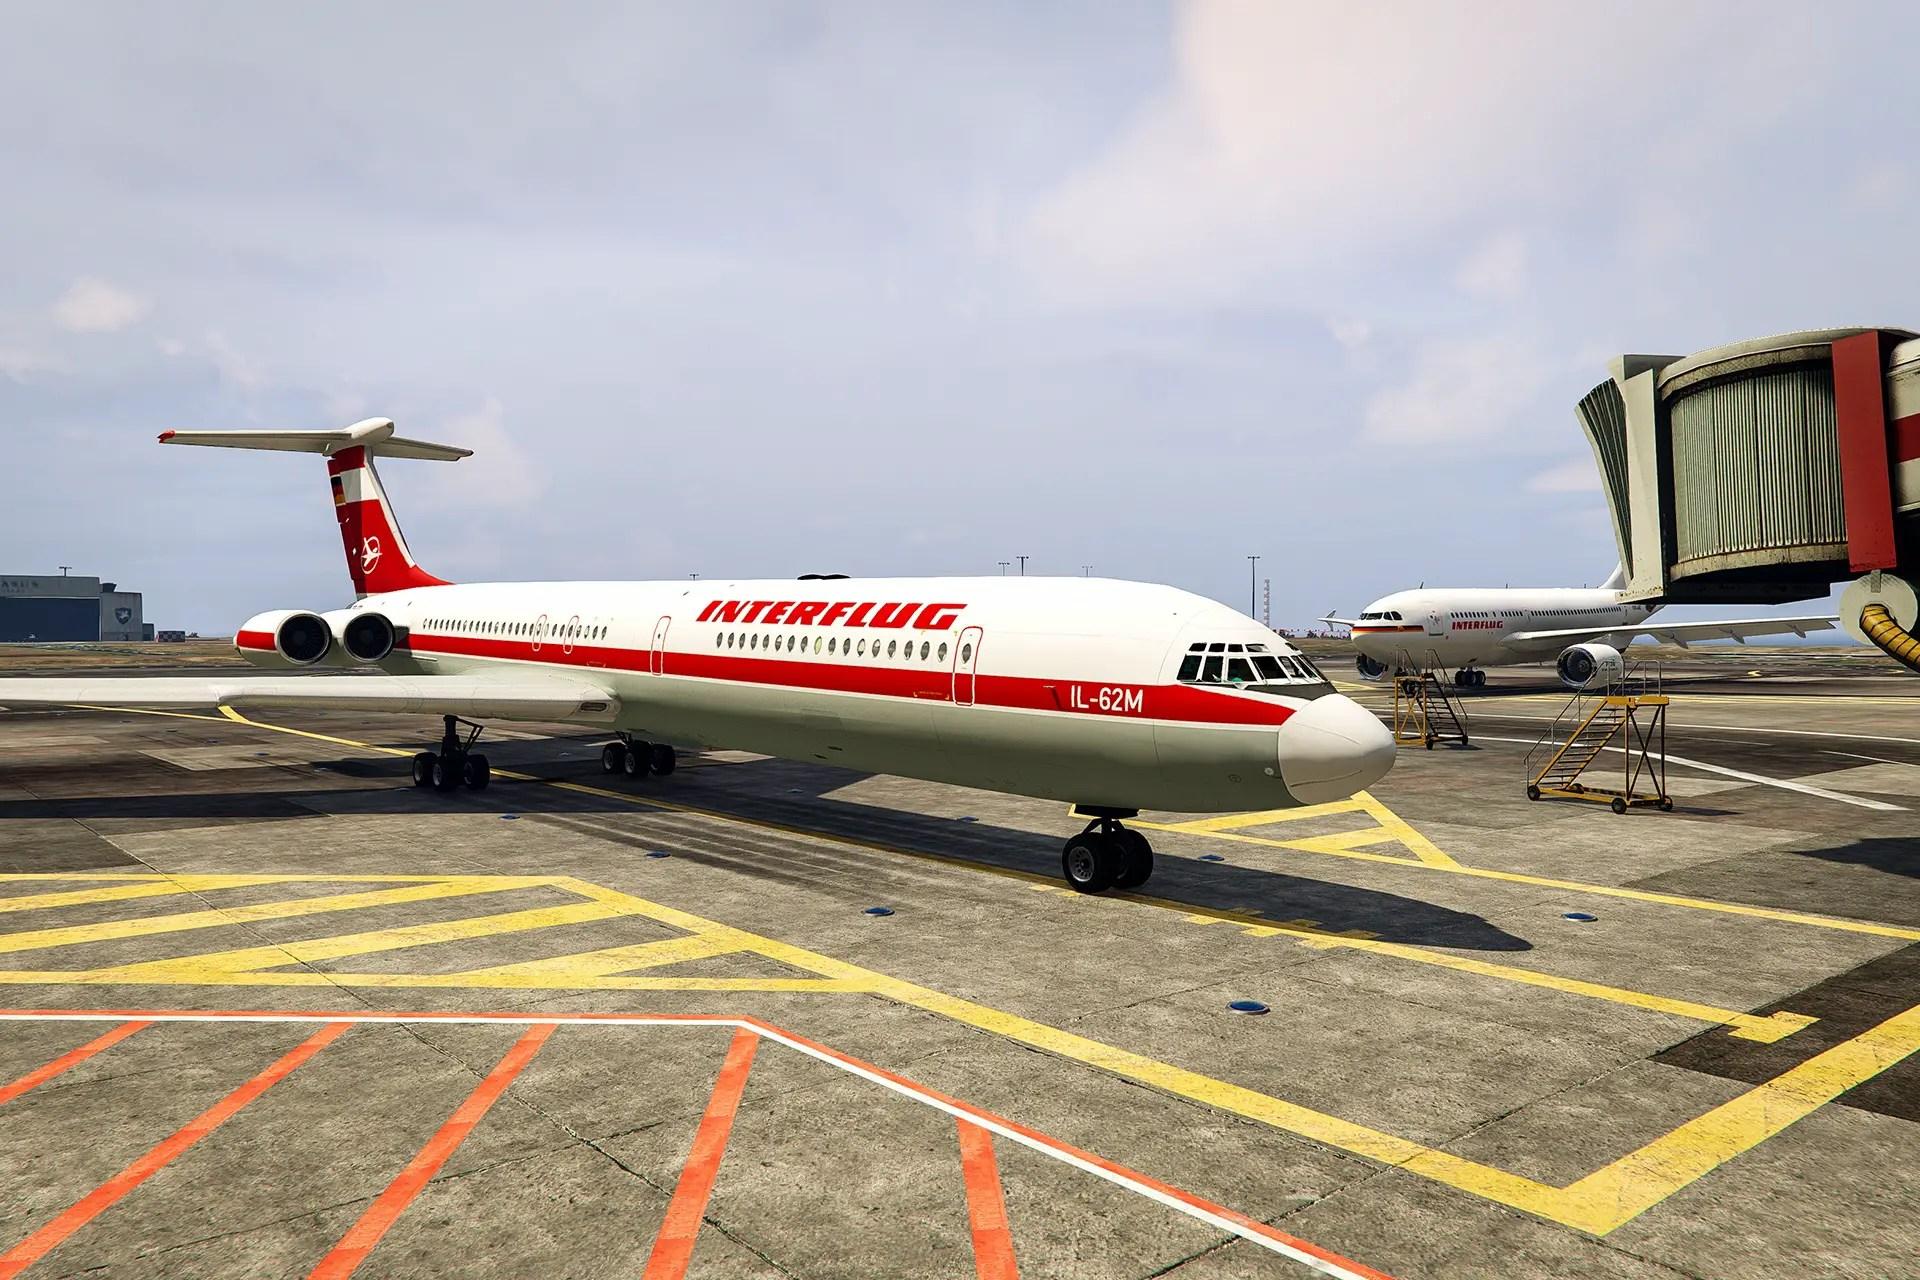 Download Interflug Ilyushin IL-62M Mod for GTA V, GTA V Mod, Gaming News, Gaming Update, gta Mods, gta V, gta V Mods, Mod, SGCArena